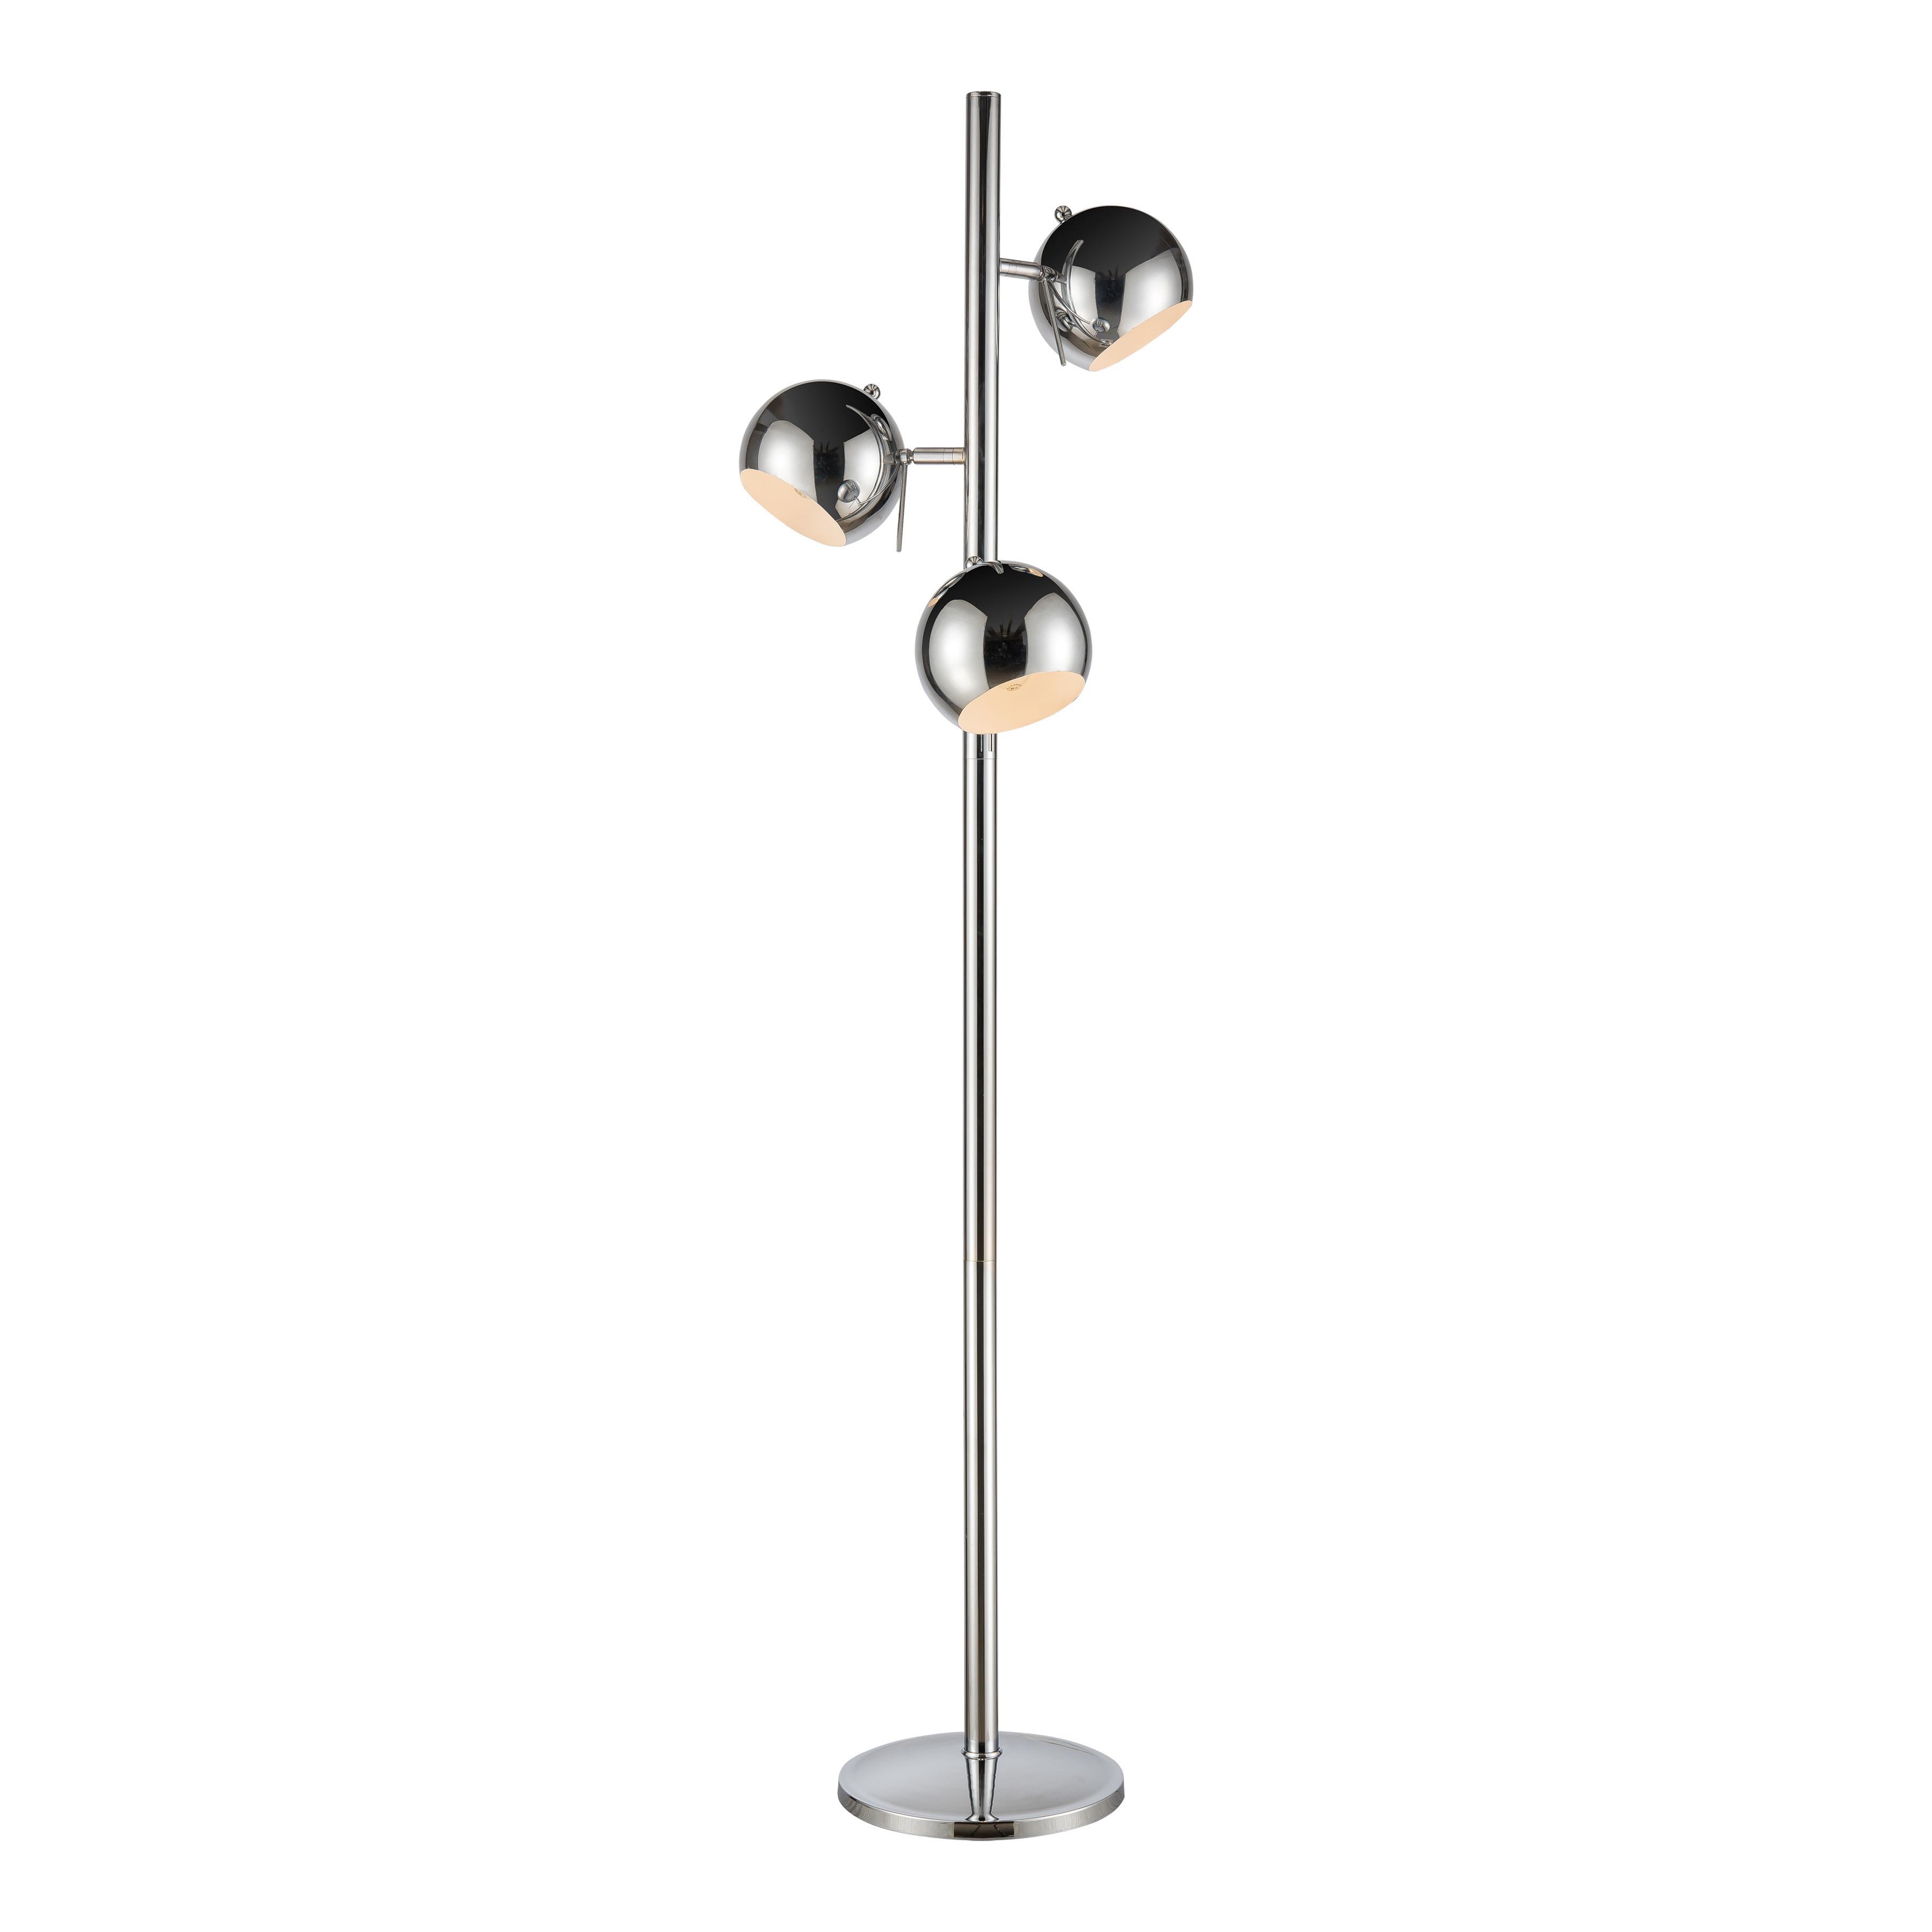 Stein World Meri 3-Light Floor Lamp